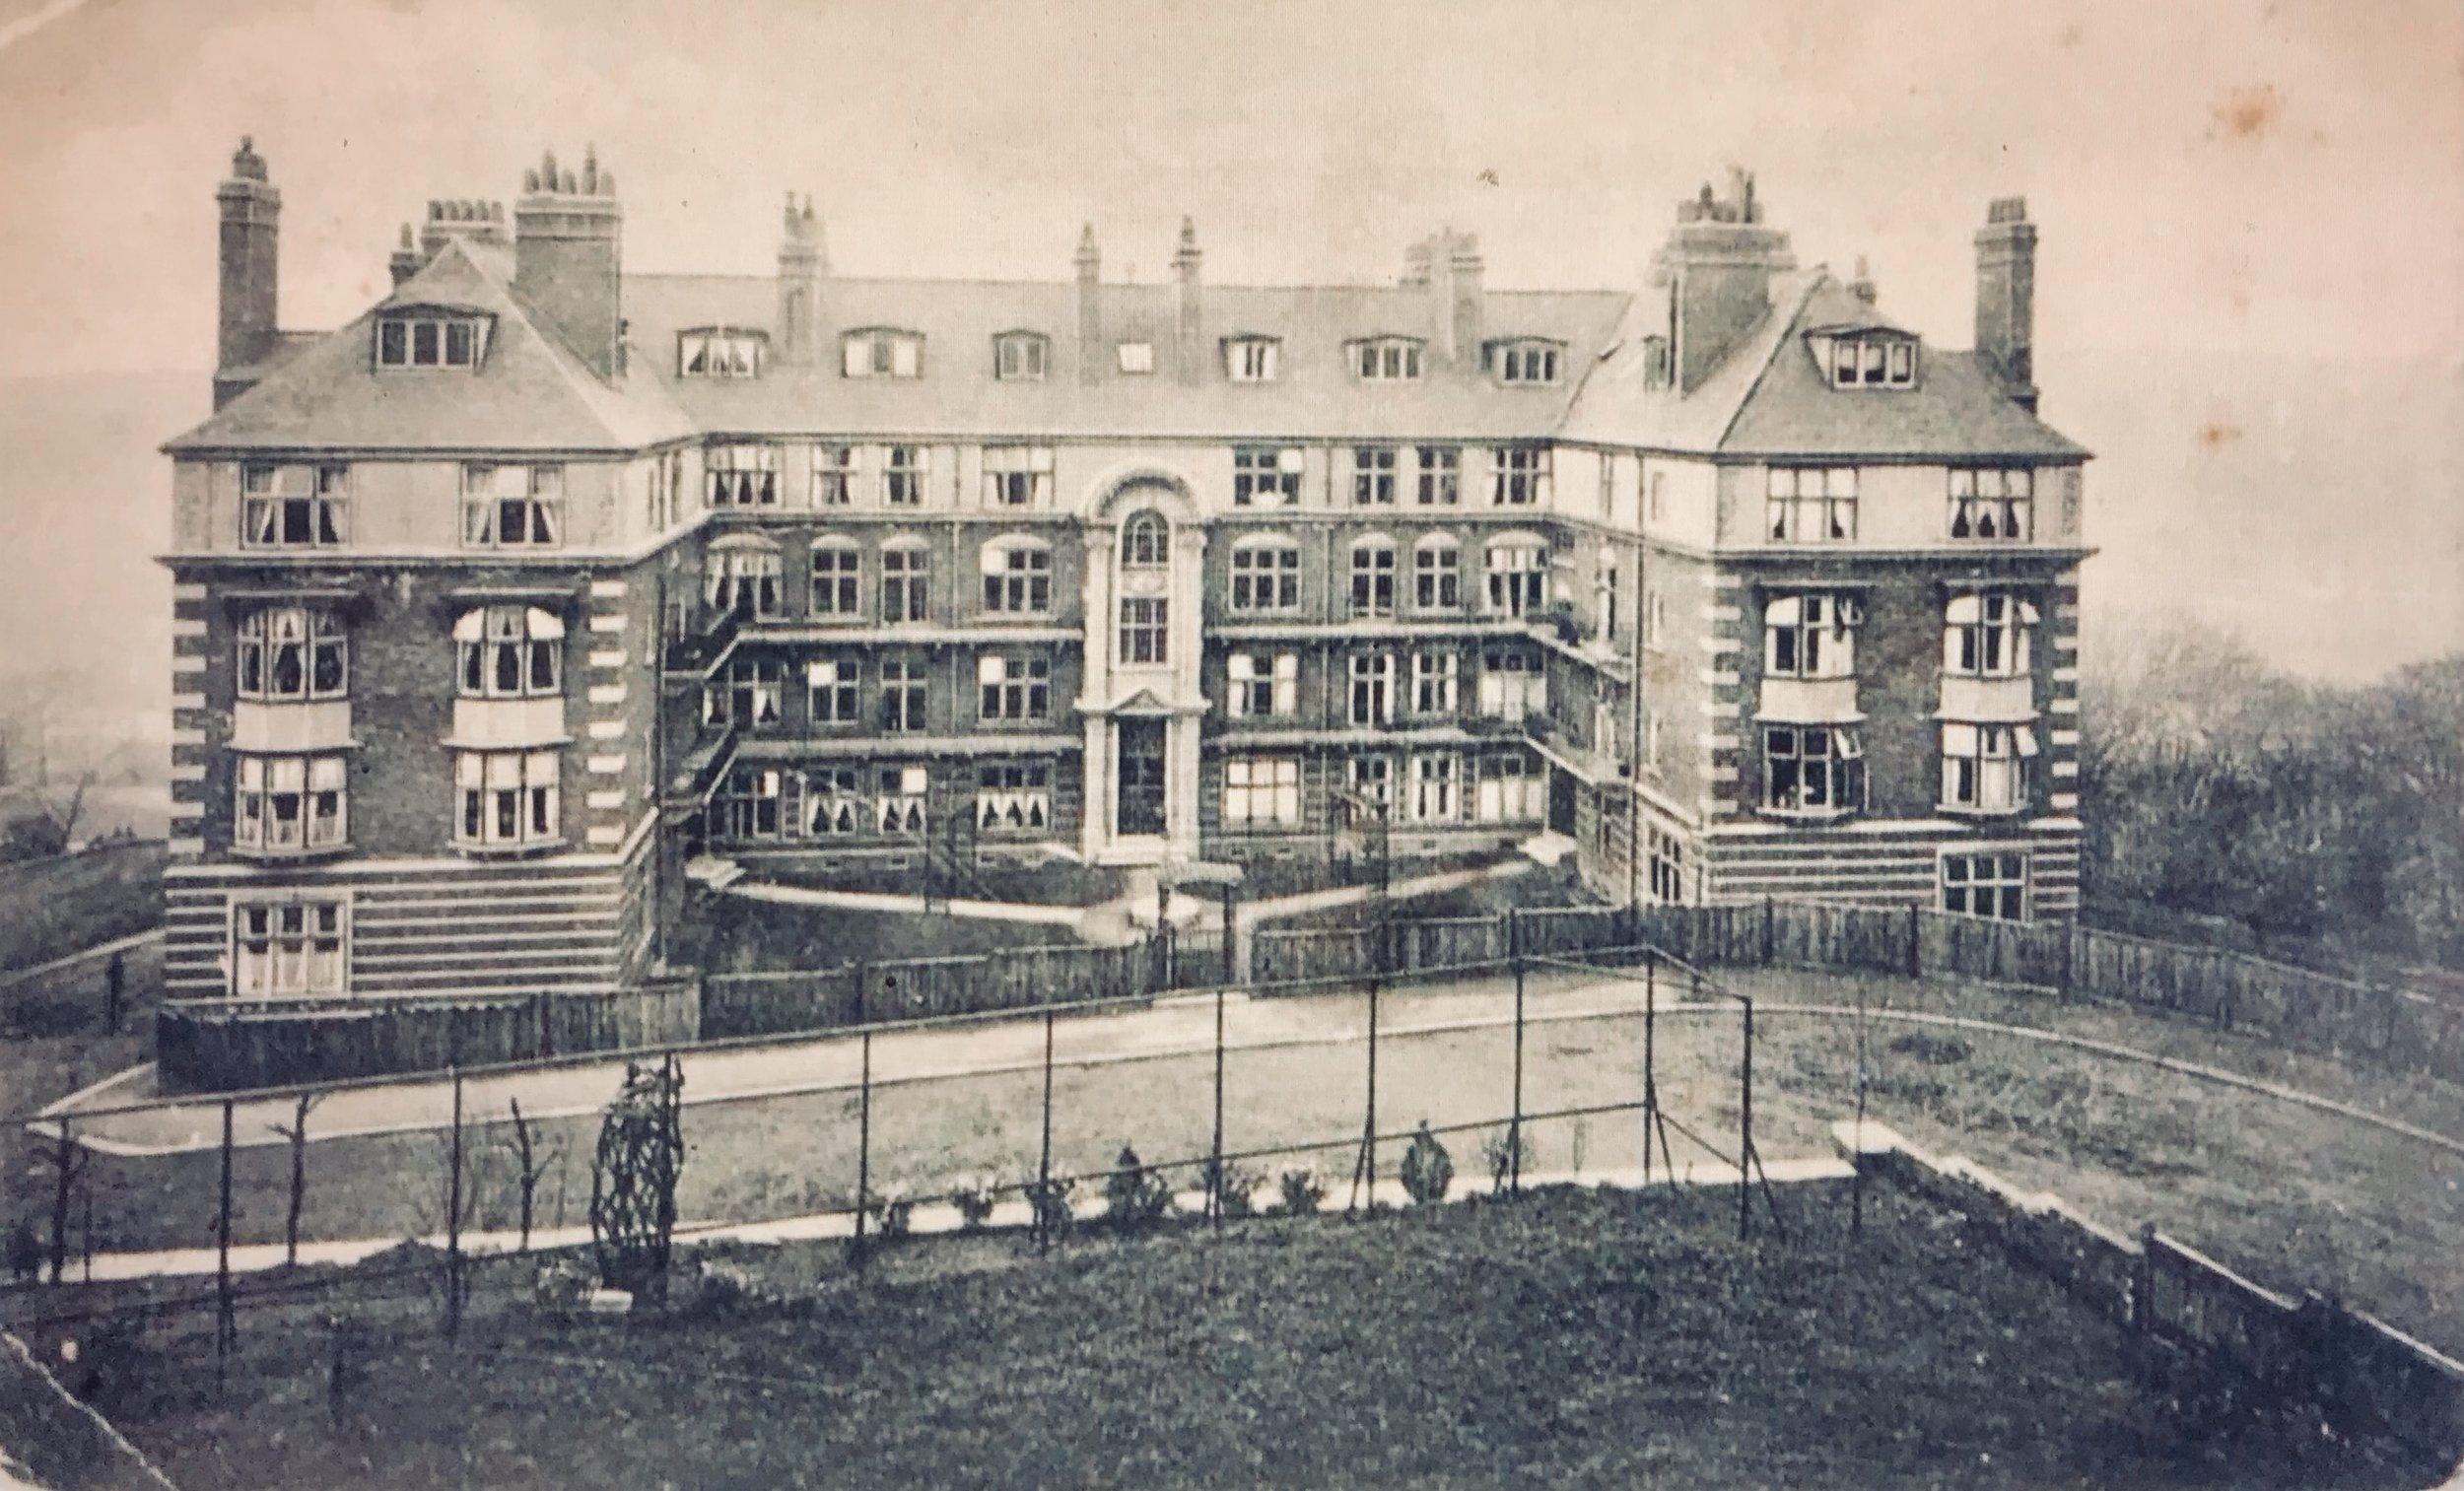 Grange Court, North Grange Mount